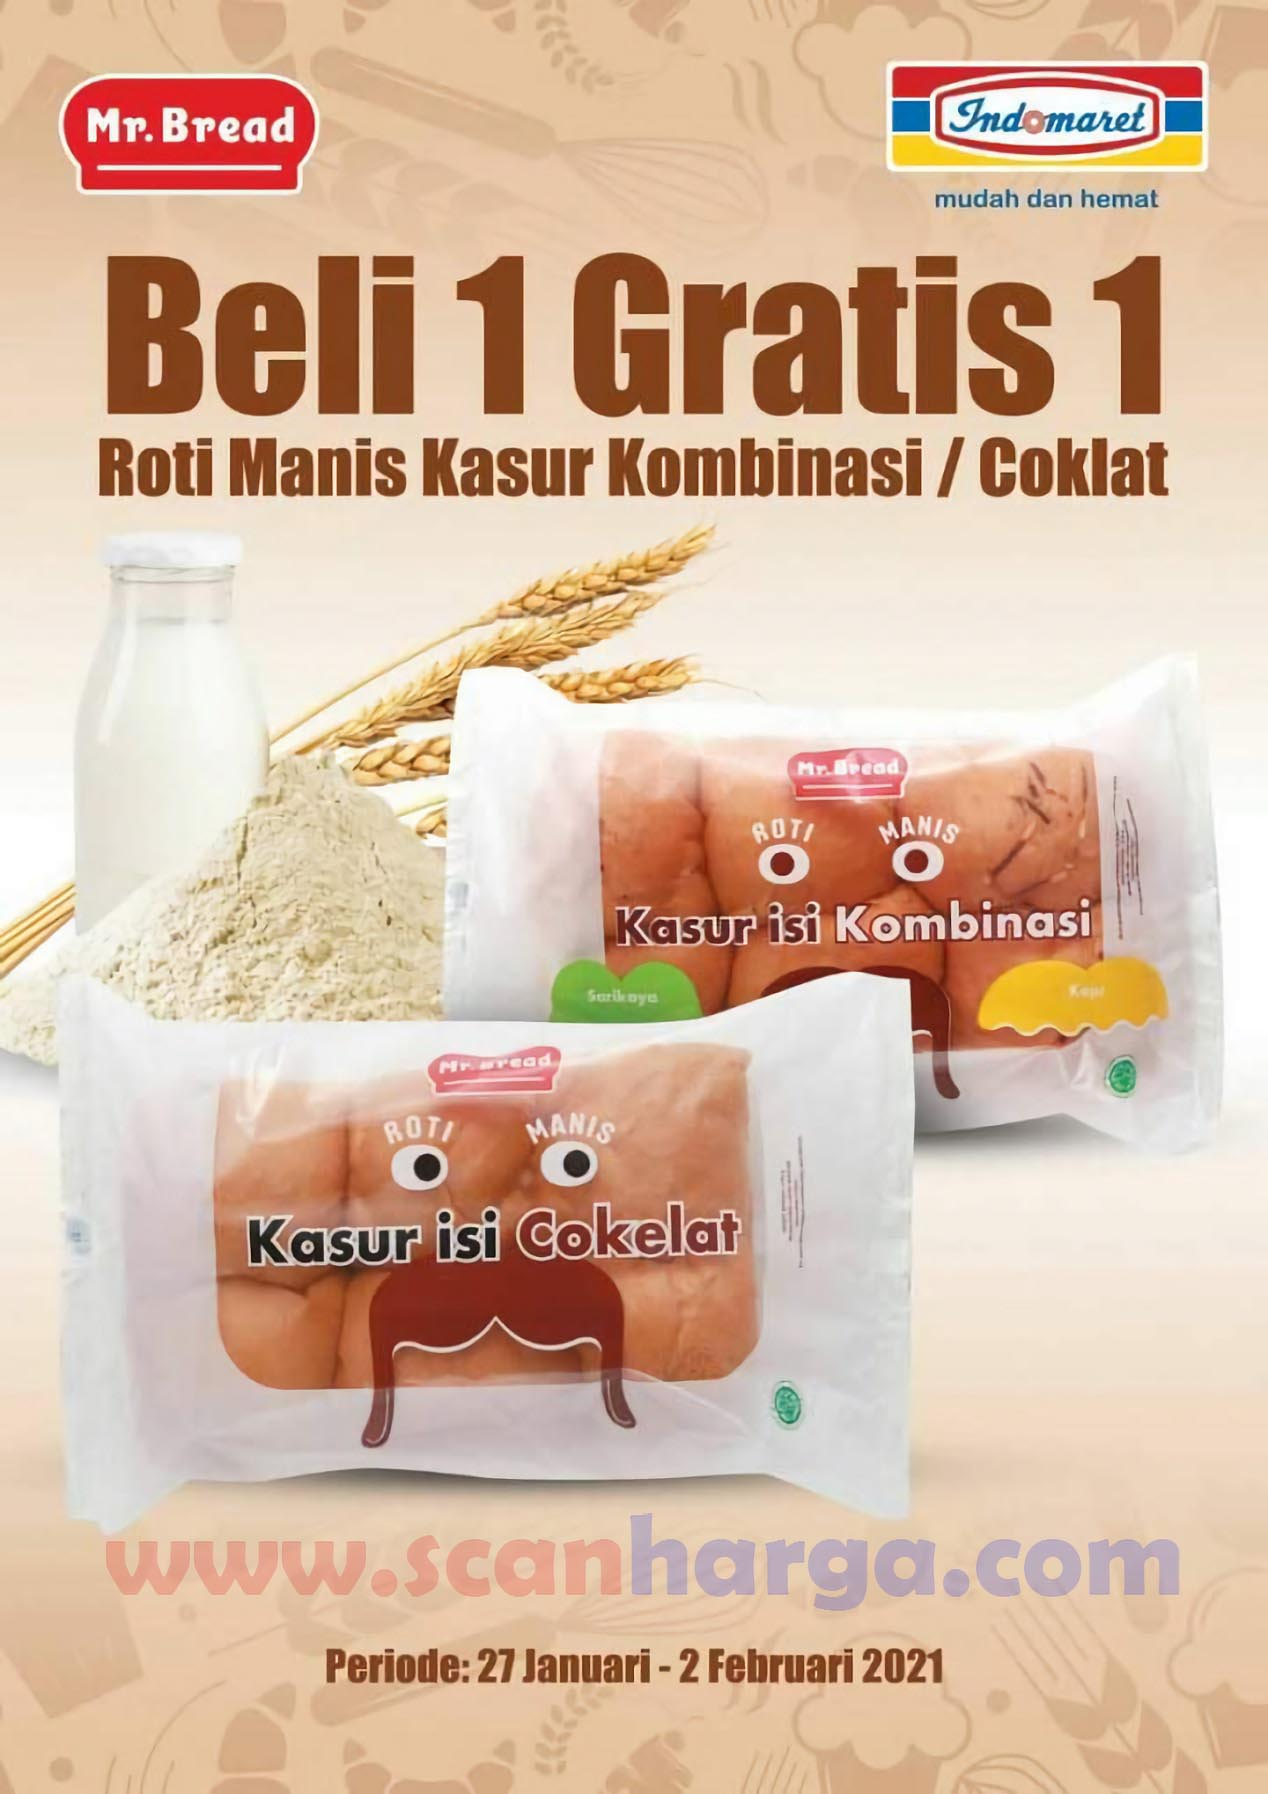 Promo Mr Bread Roti Indomaret Beli 1 Gratis 1* 27 Januari - 2 Februari 2021